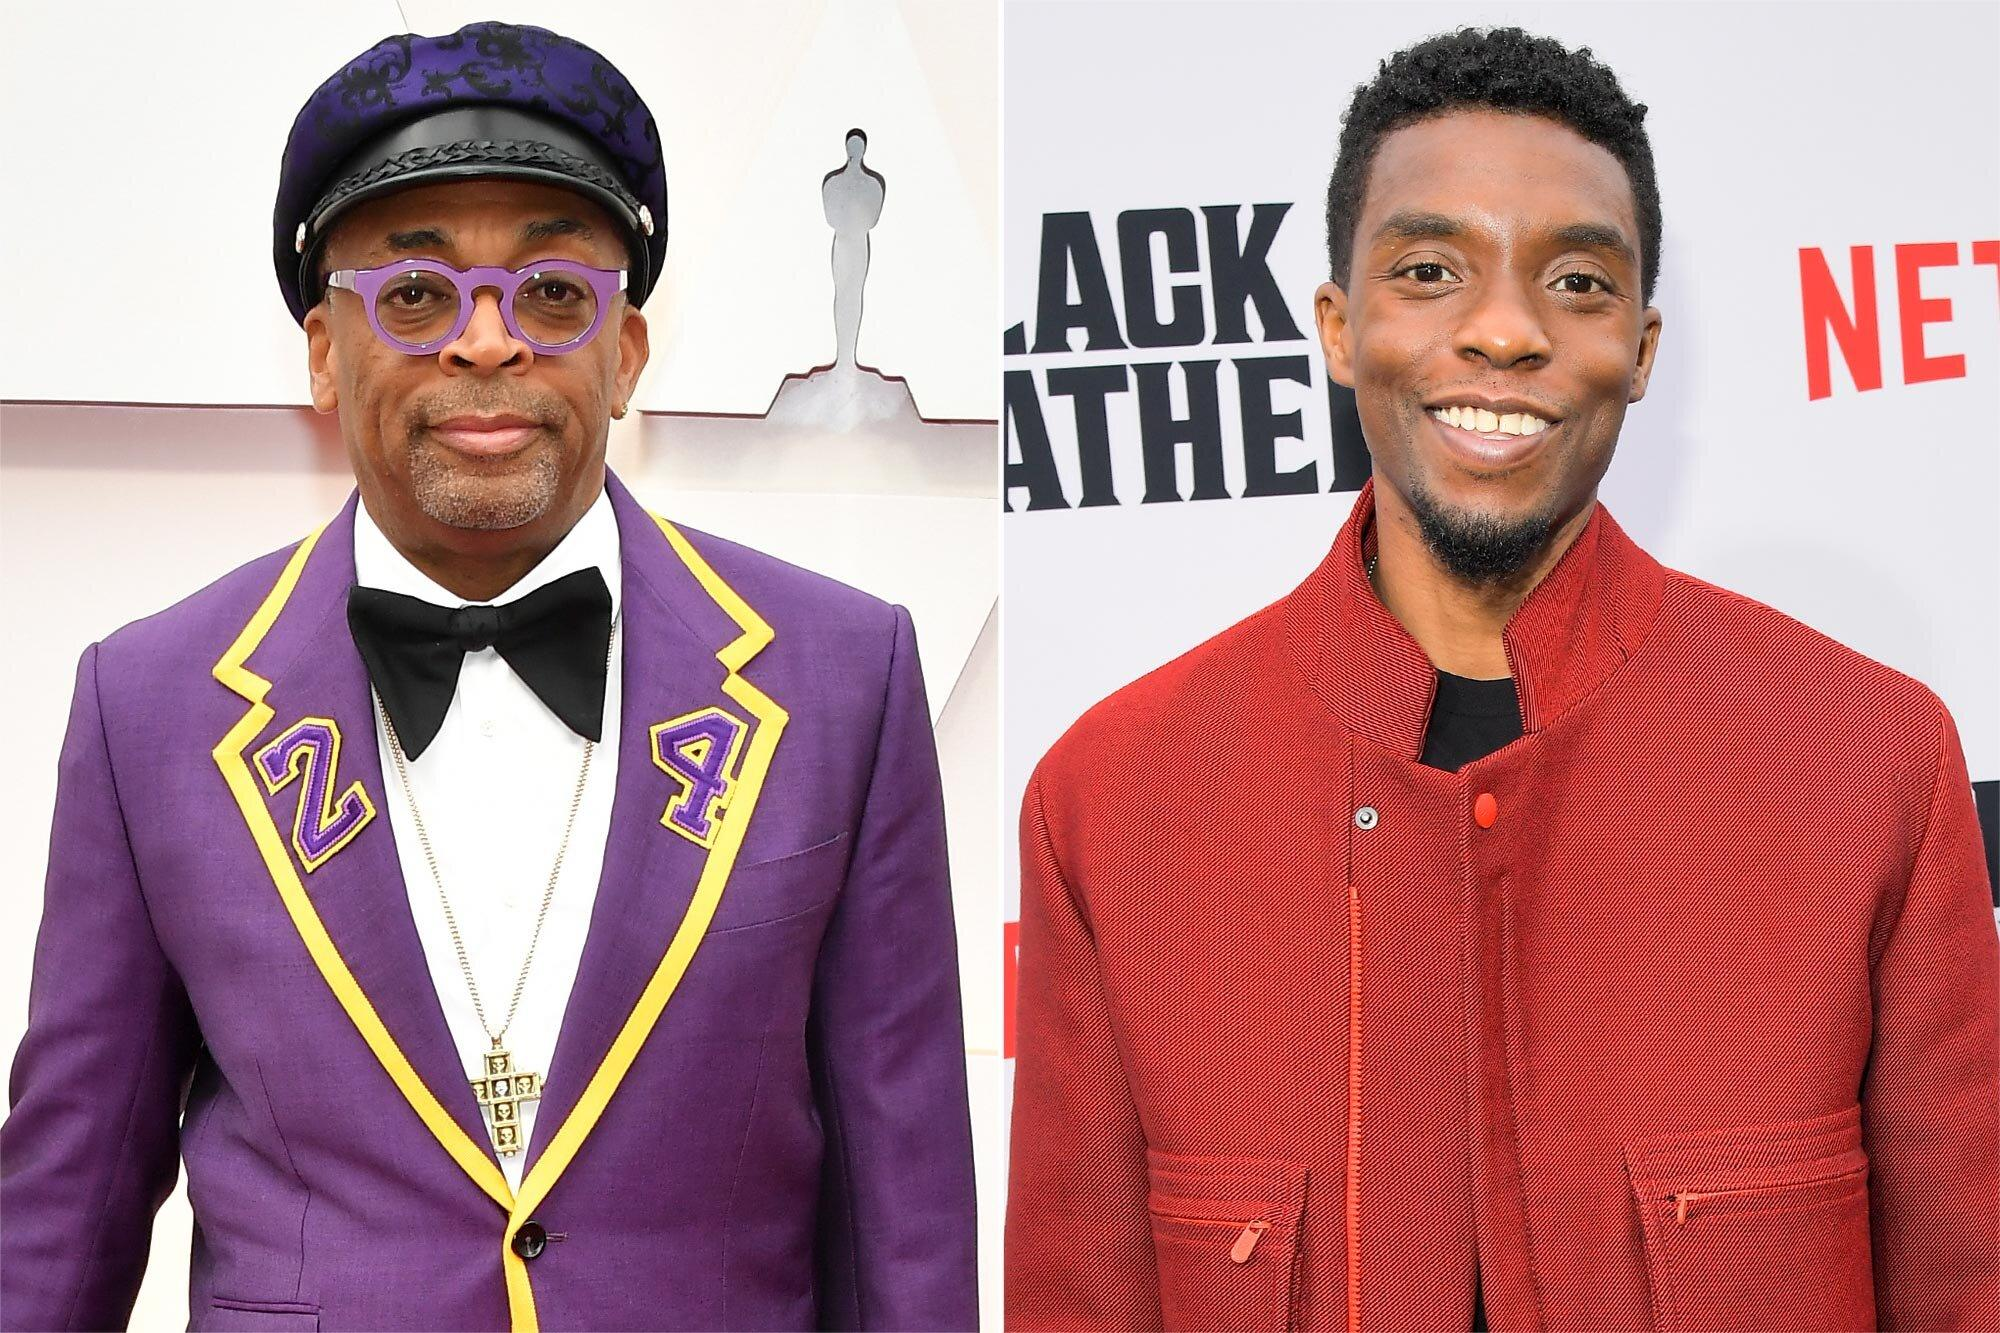 Spike Lee film Da 5 Bloods starring Chadwick Boseman gets Netflix premiere